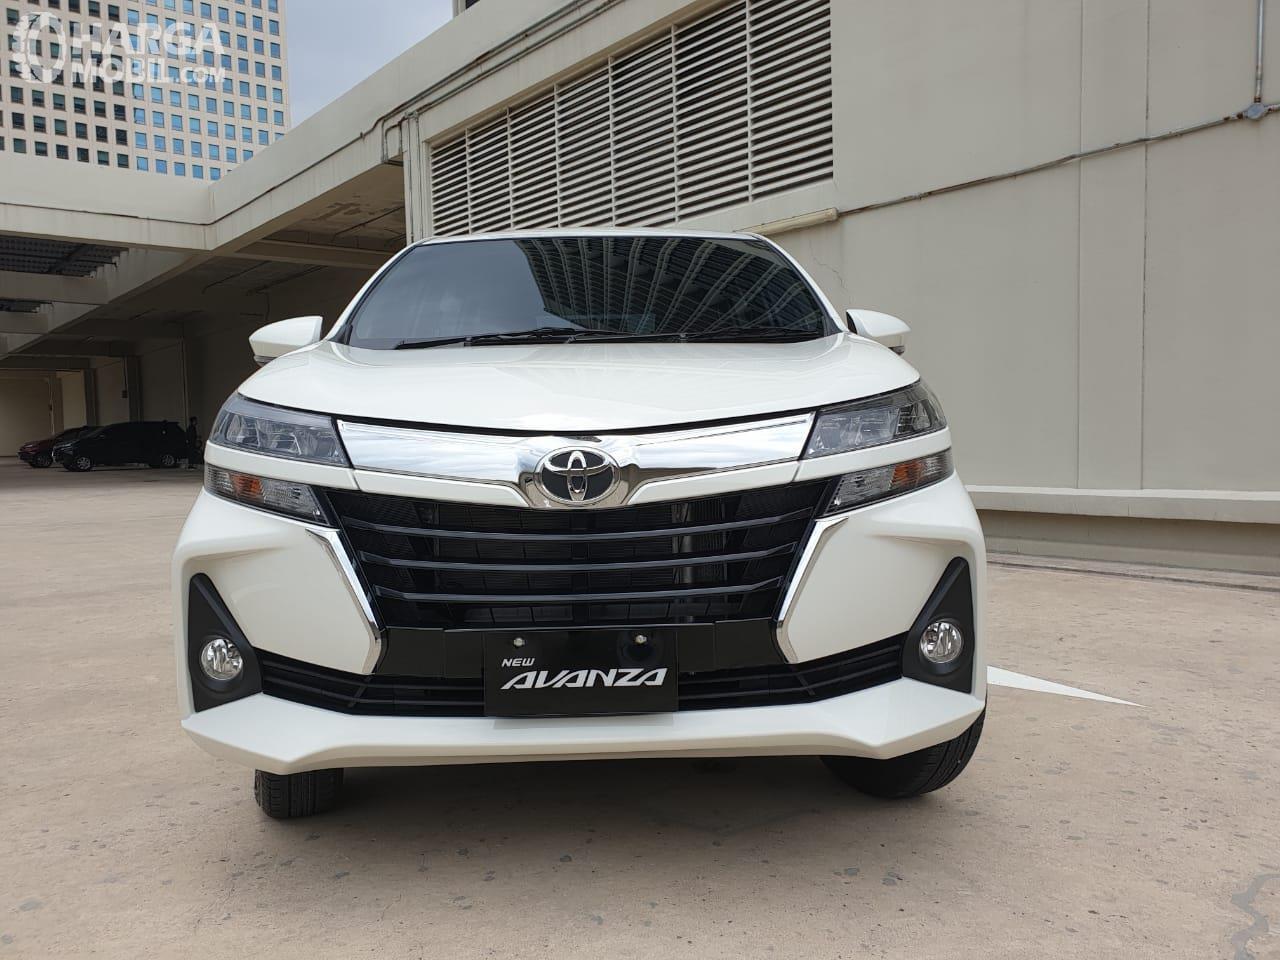 Foto bagian depan Toyota Avanza 2019